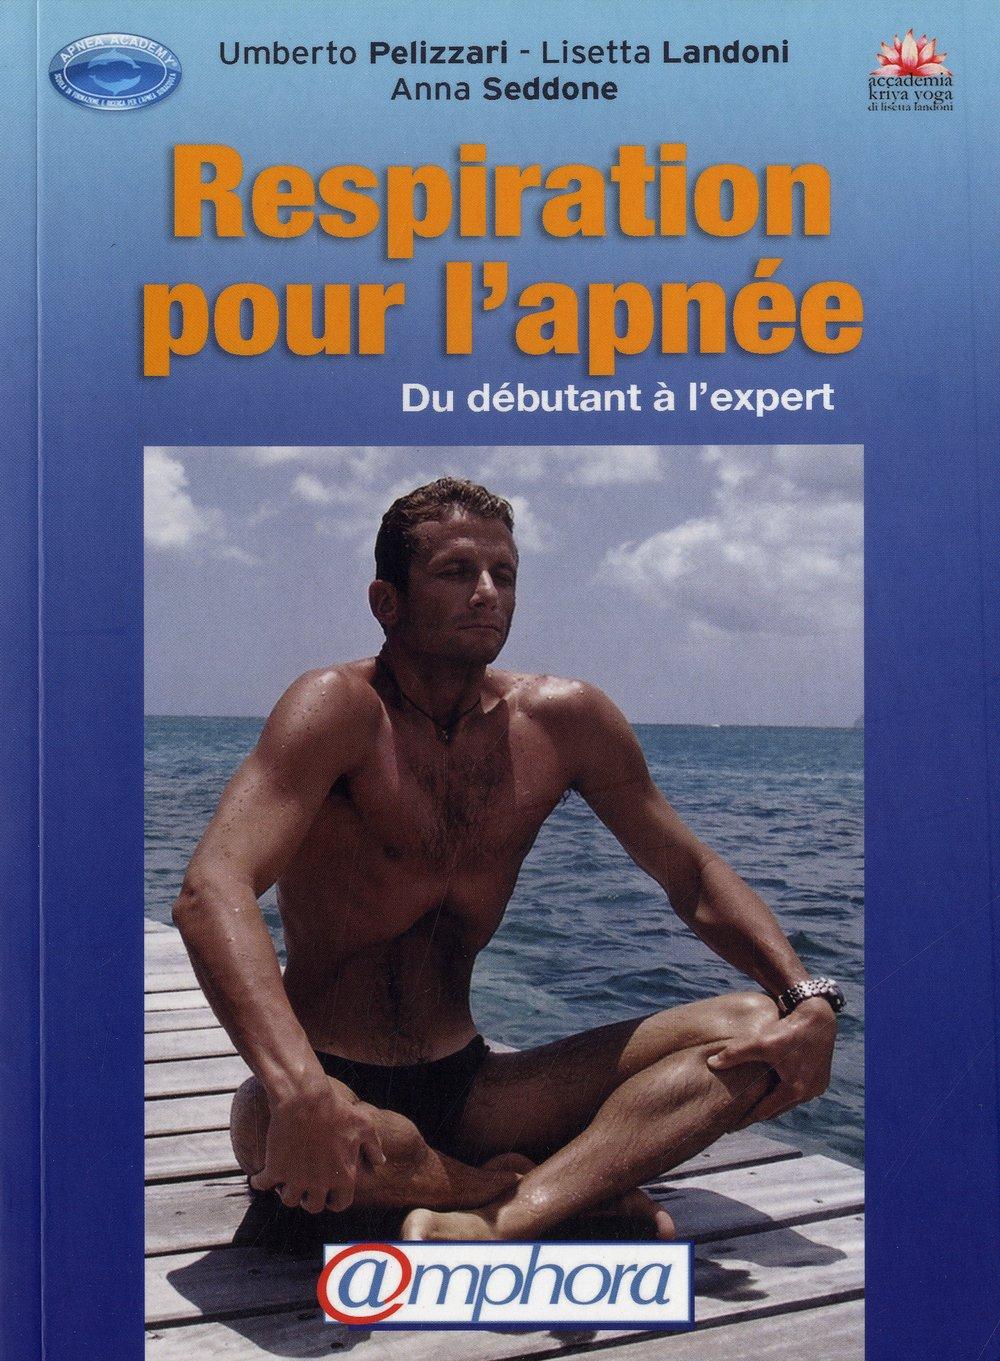 Umberto Pelizzari - Respiration pour l'apnée